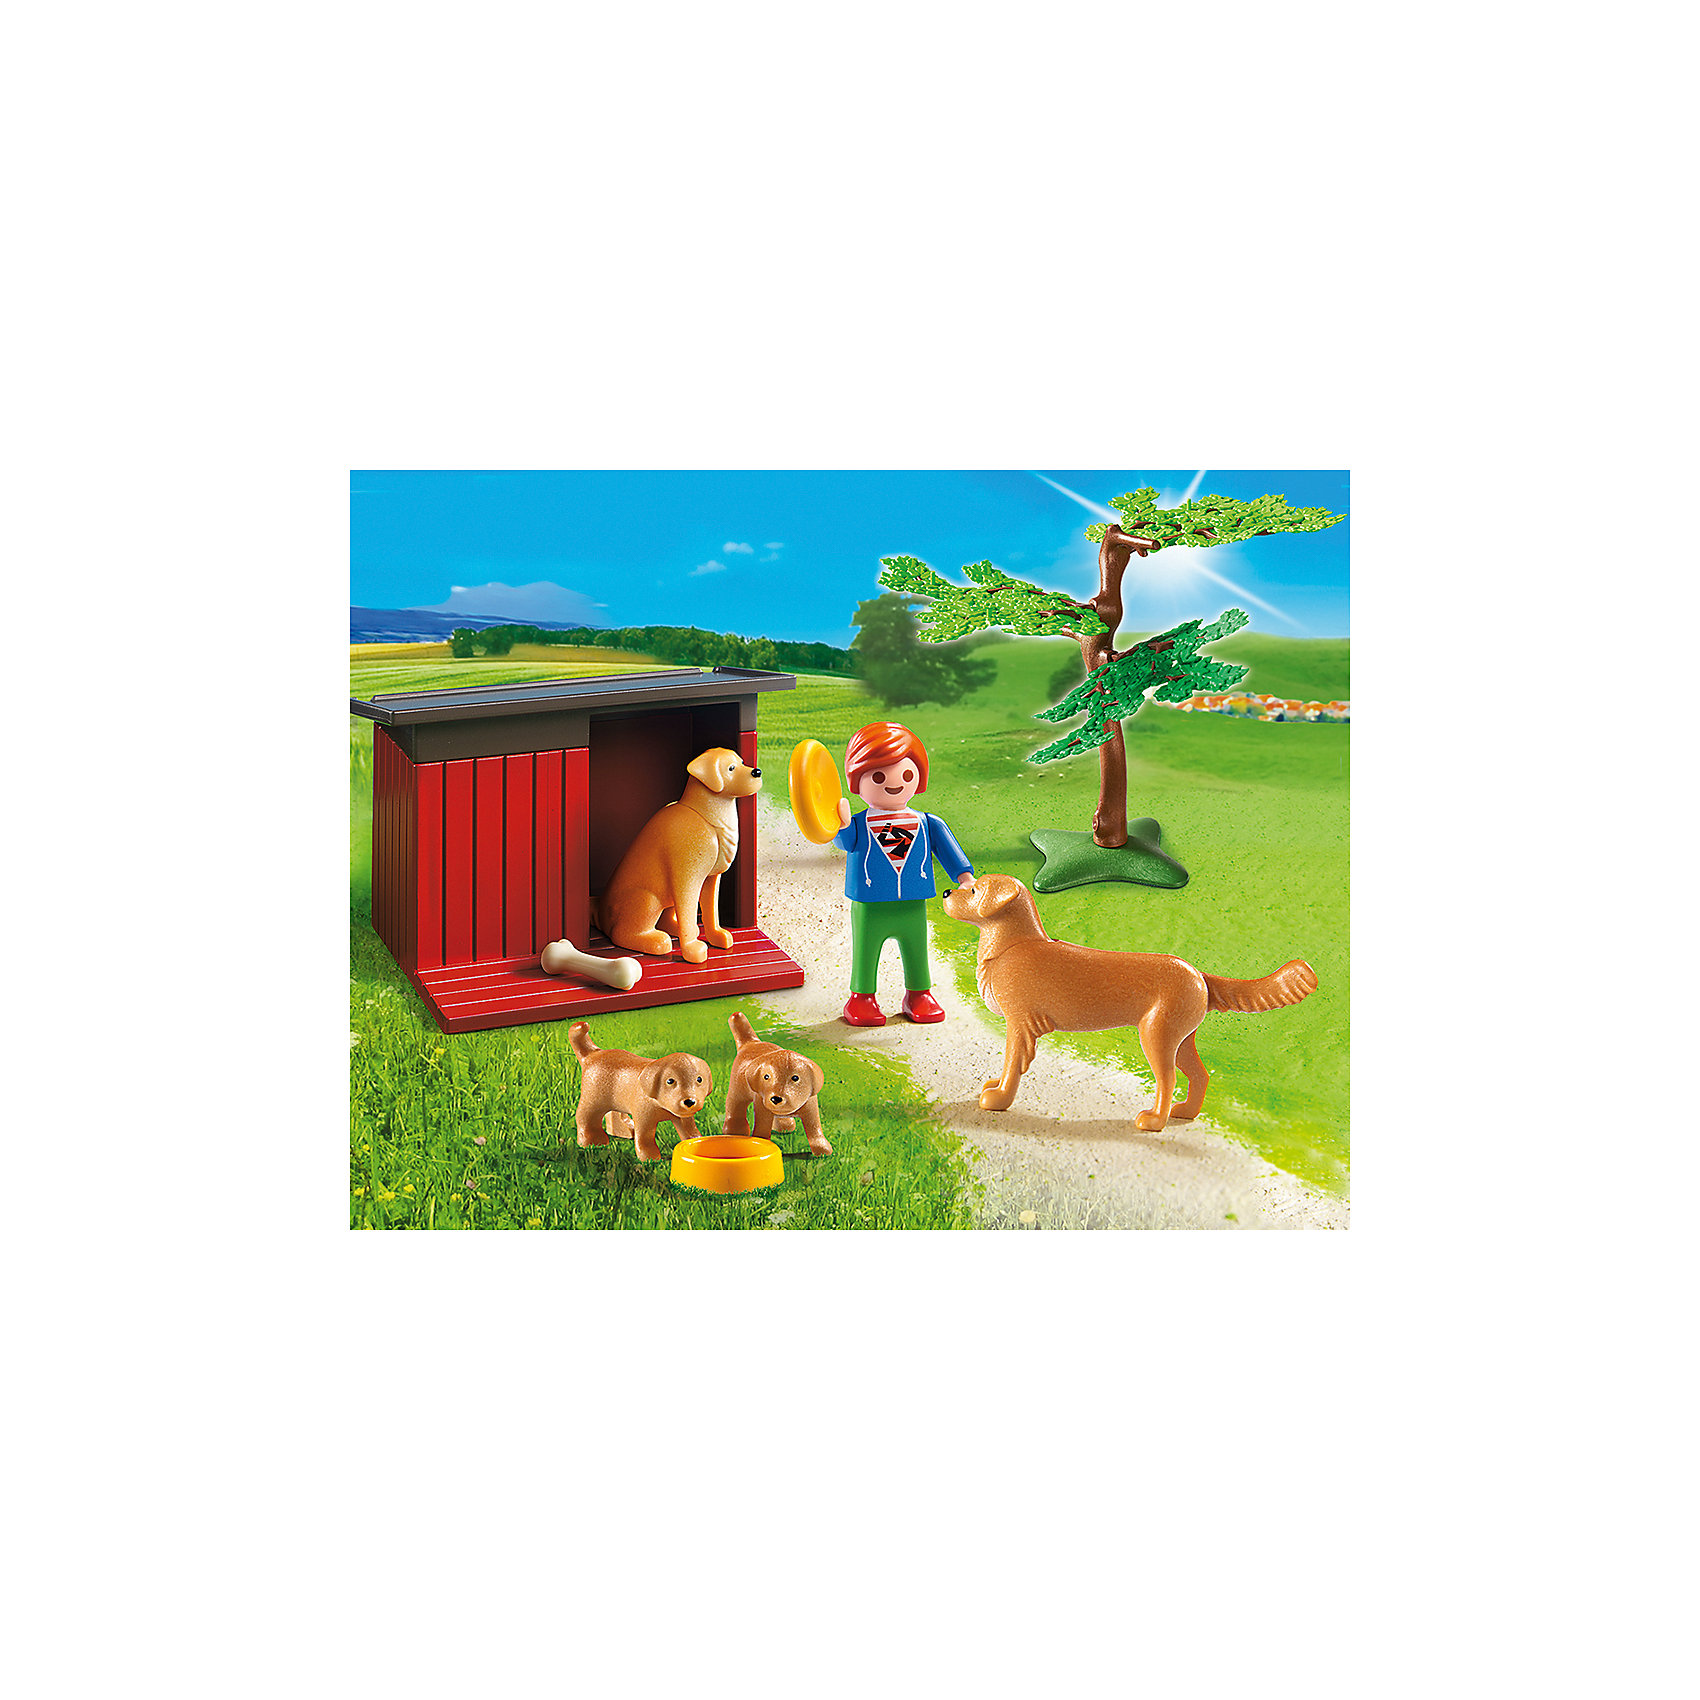 PLAYMOBIL® Ферма: Золотые ретриверы с щенками, PLAYMOBIL playmobil® playmobil 5546 парк развлечений продавец шаров smileyworld